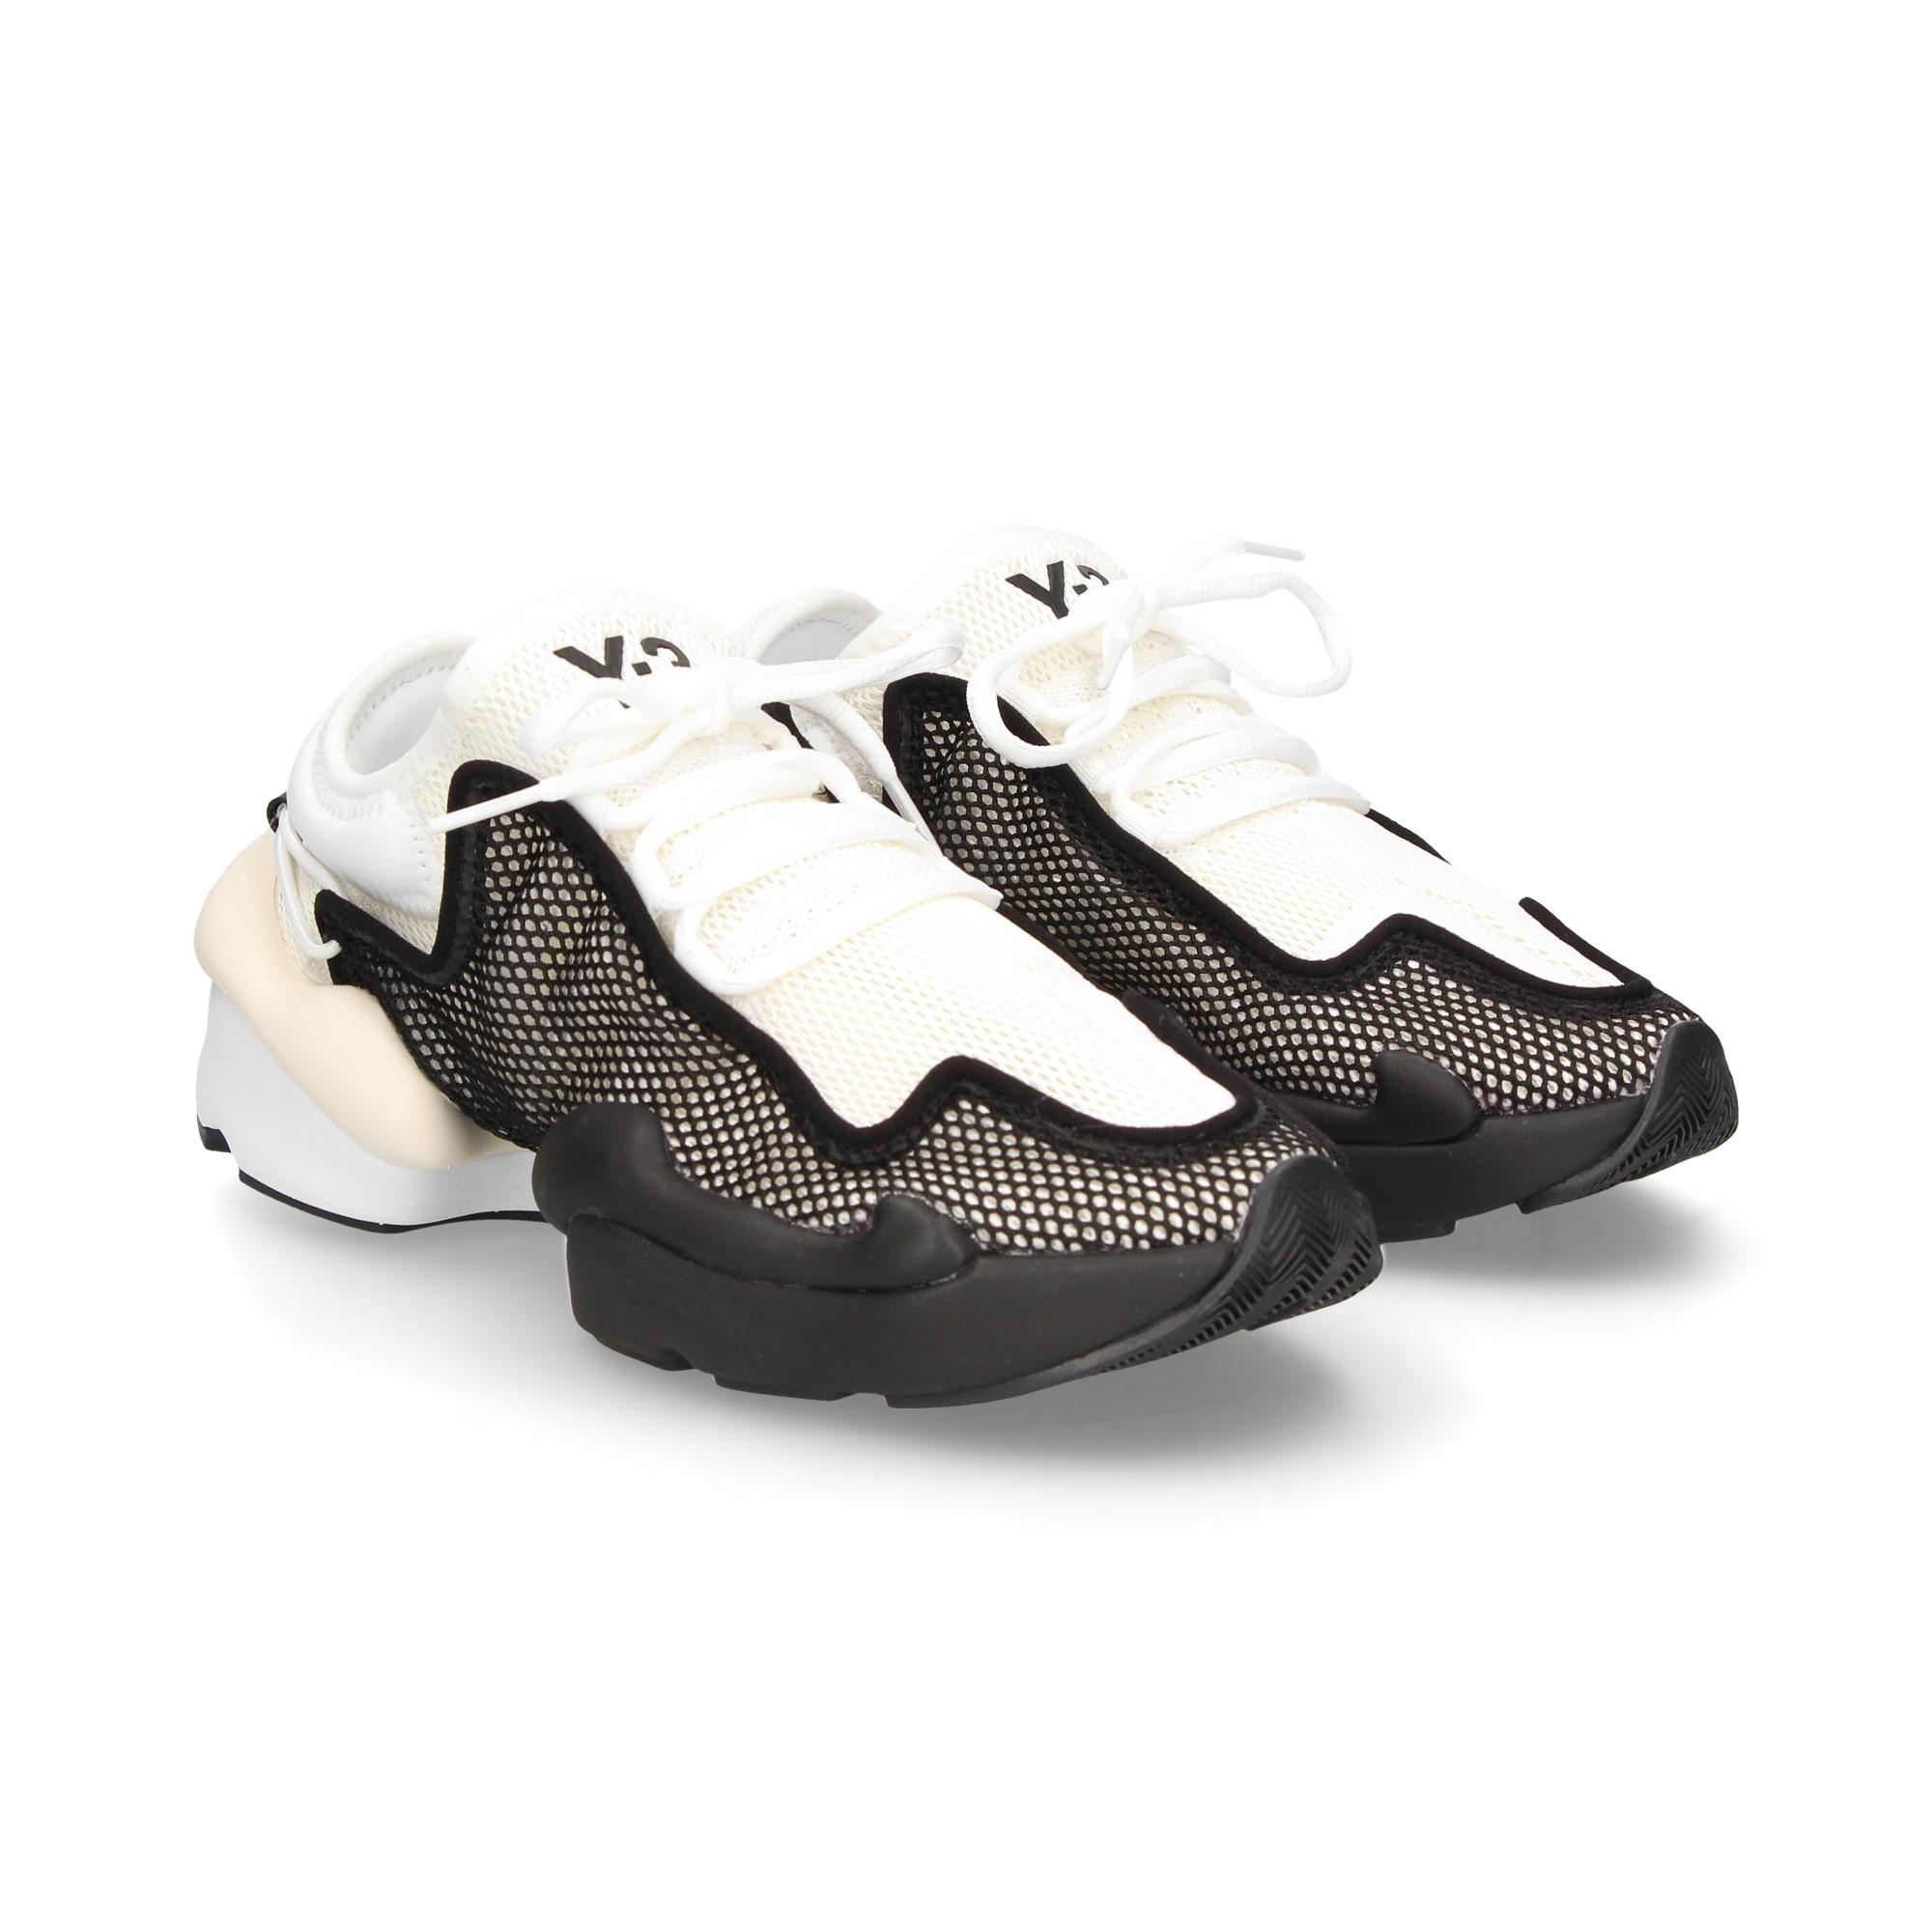 Y3 ADIDAS Chaussures de sport pour femmes Y-3 REN BLACK-Y3 ...